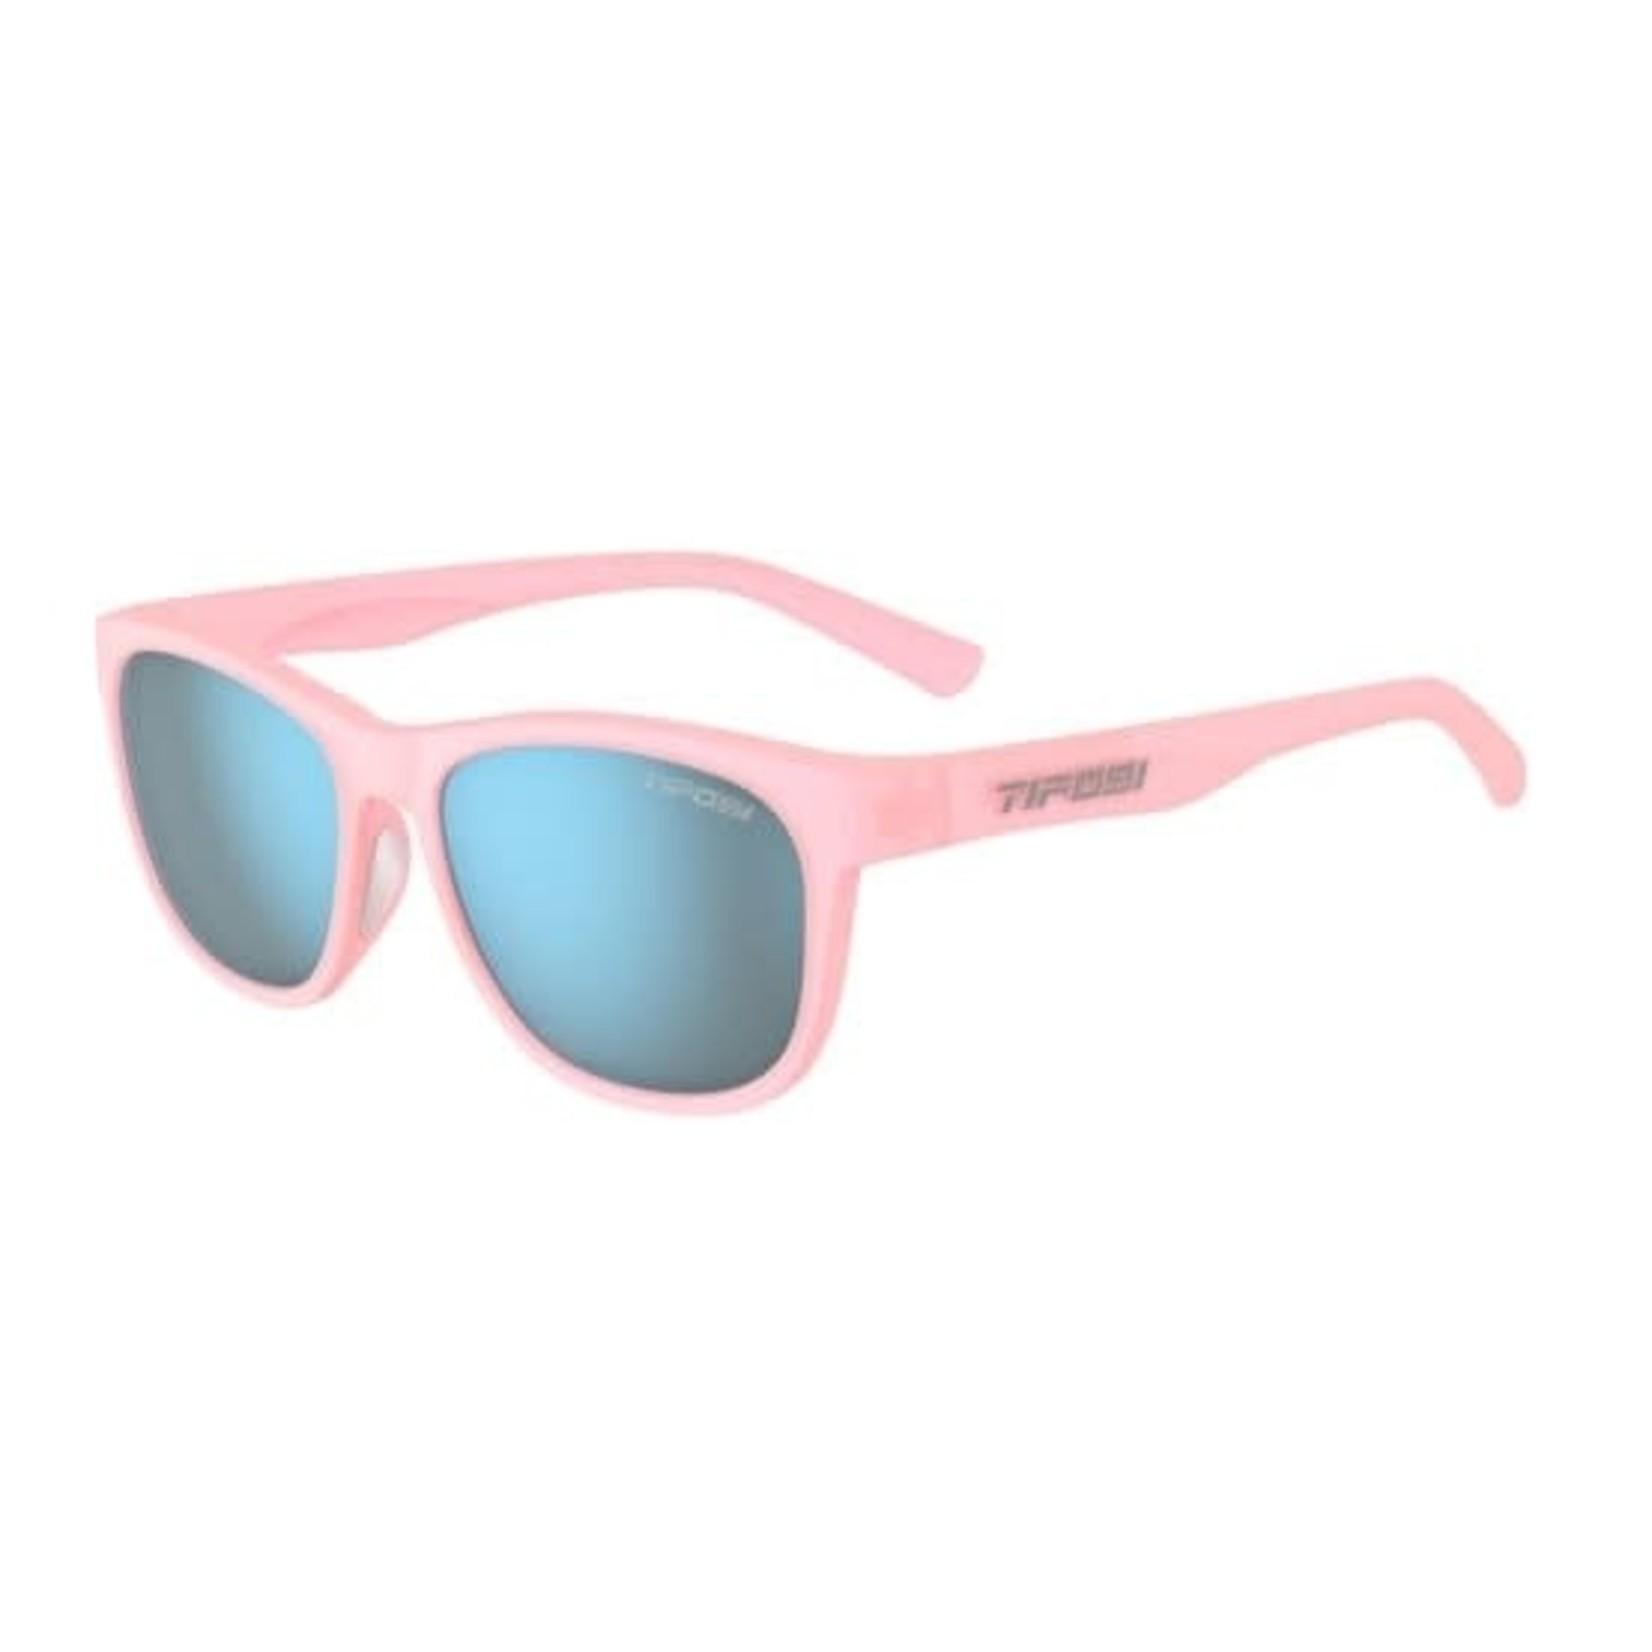 Tifosi Optics Swank, Satin Crystal Blush  Single Lens Sunglasses